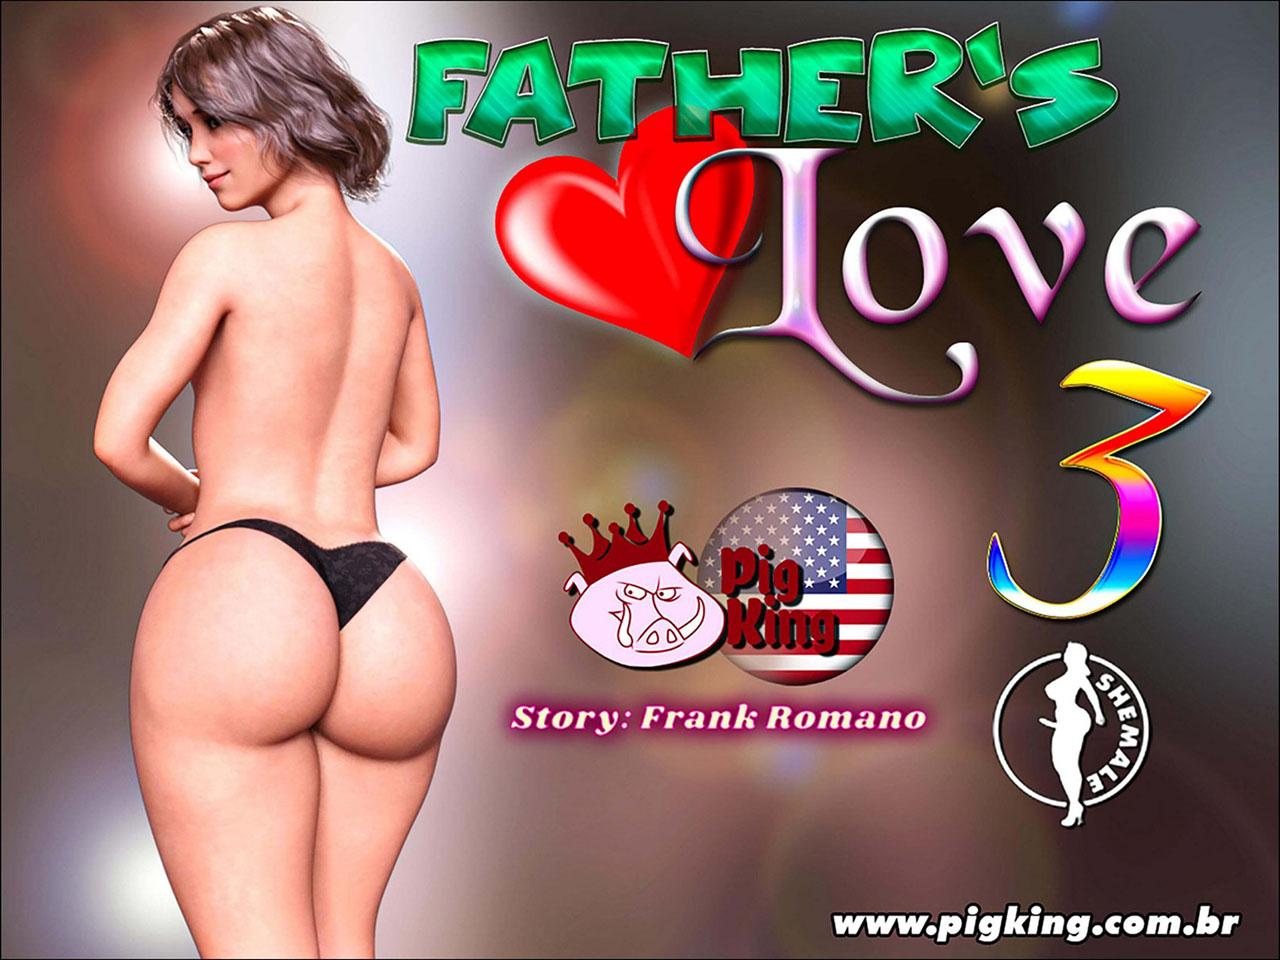 FATHERS LOVE parte 3